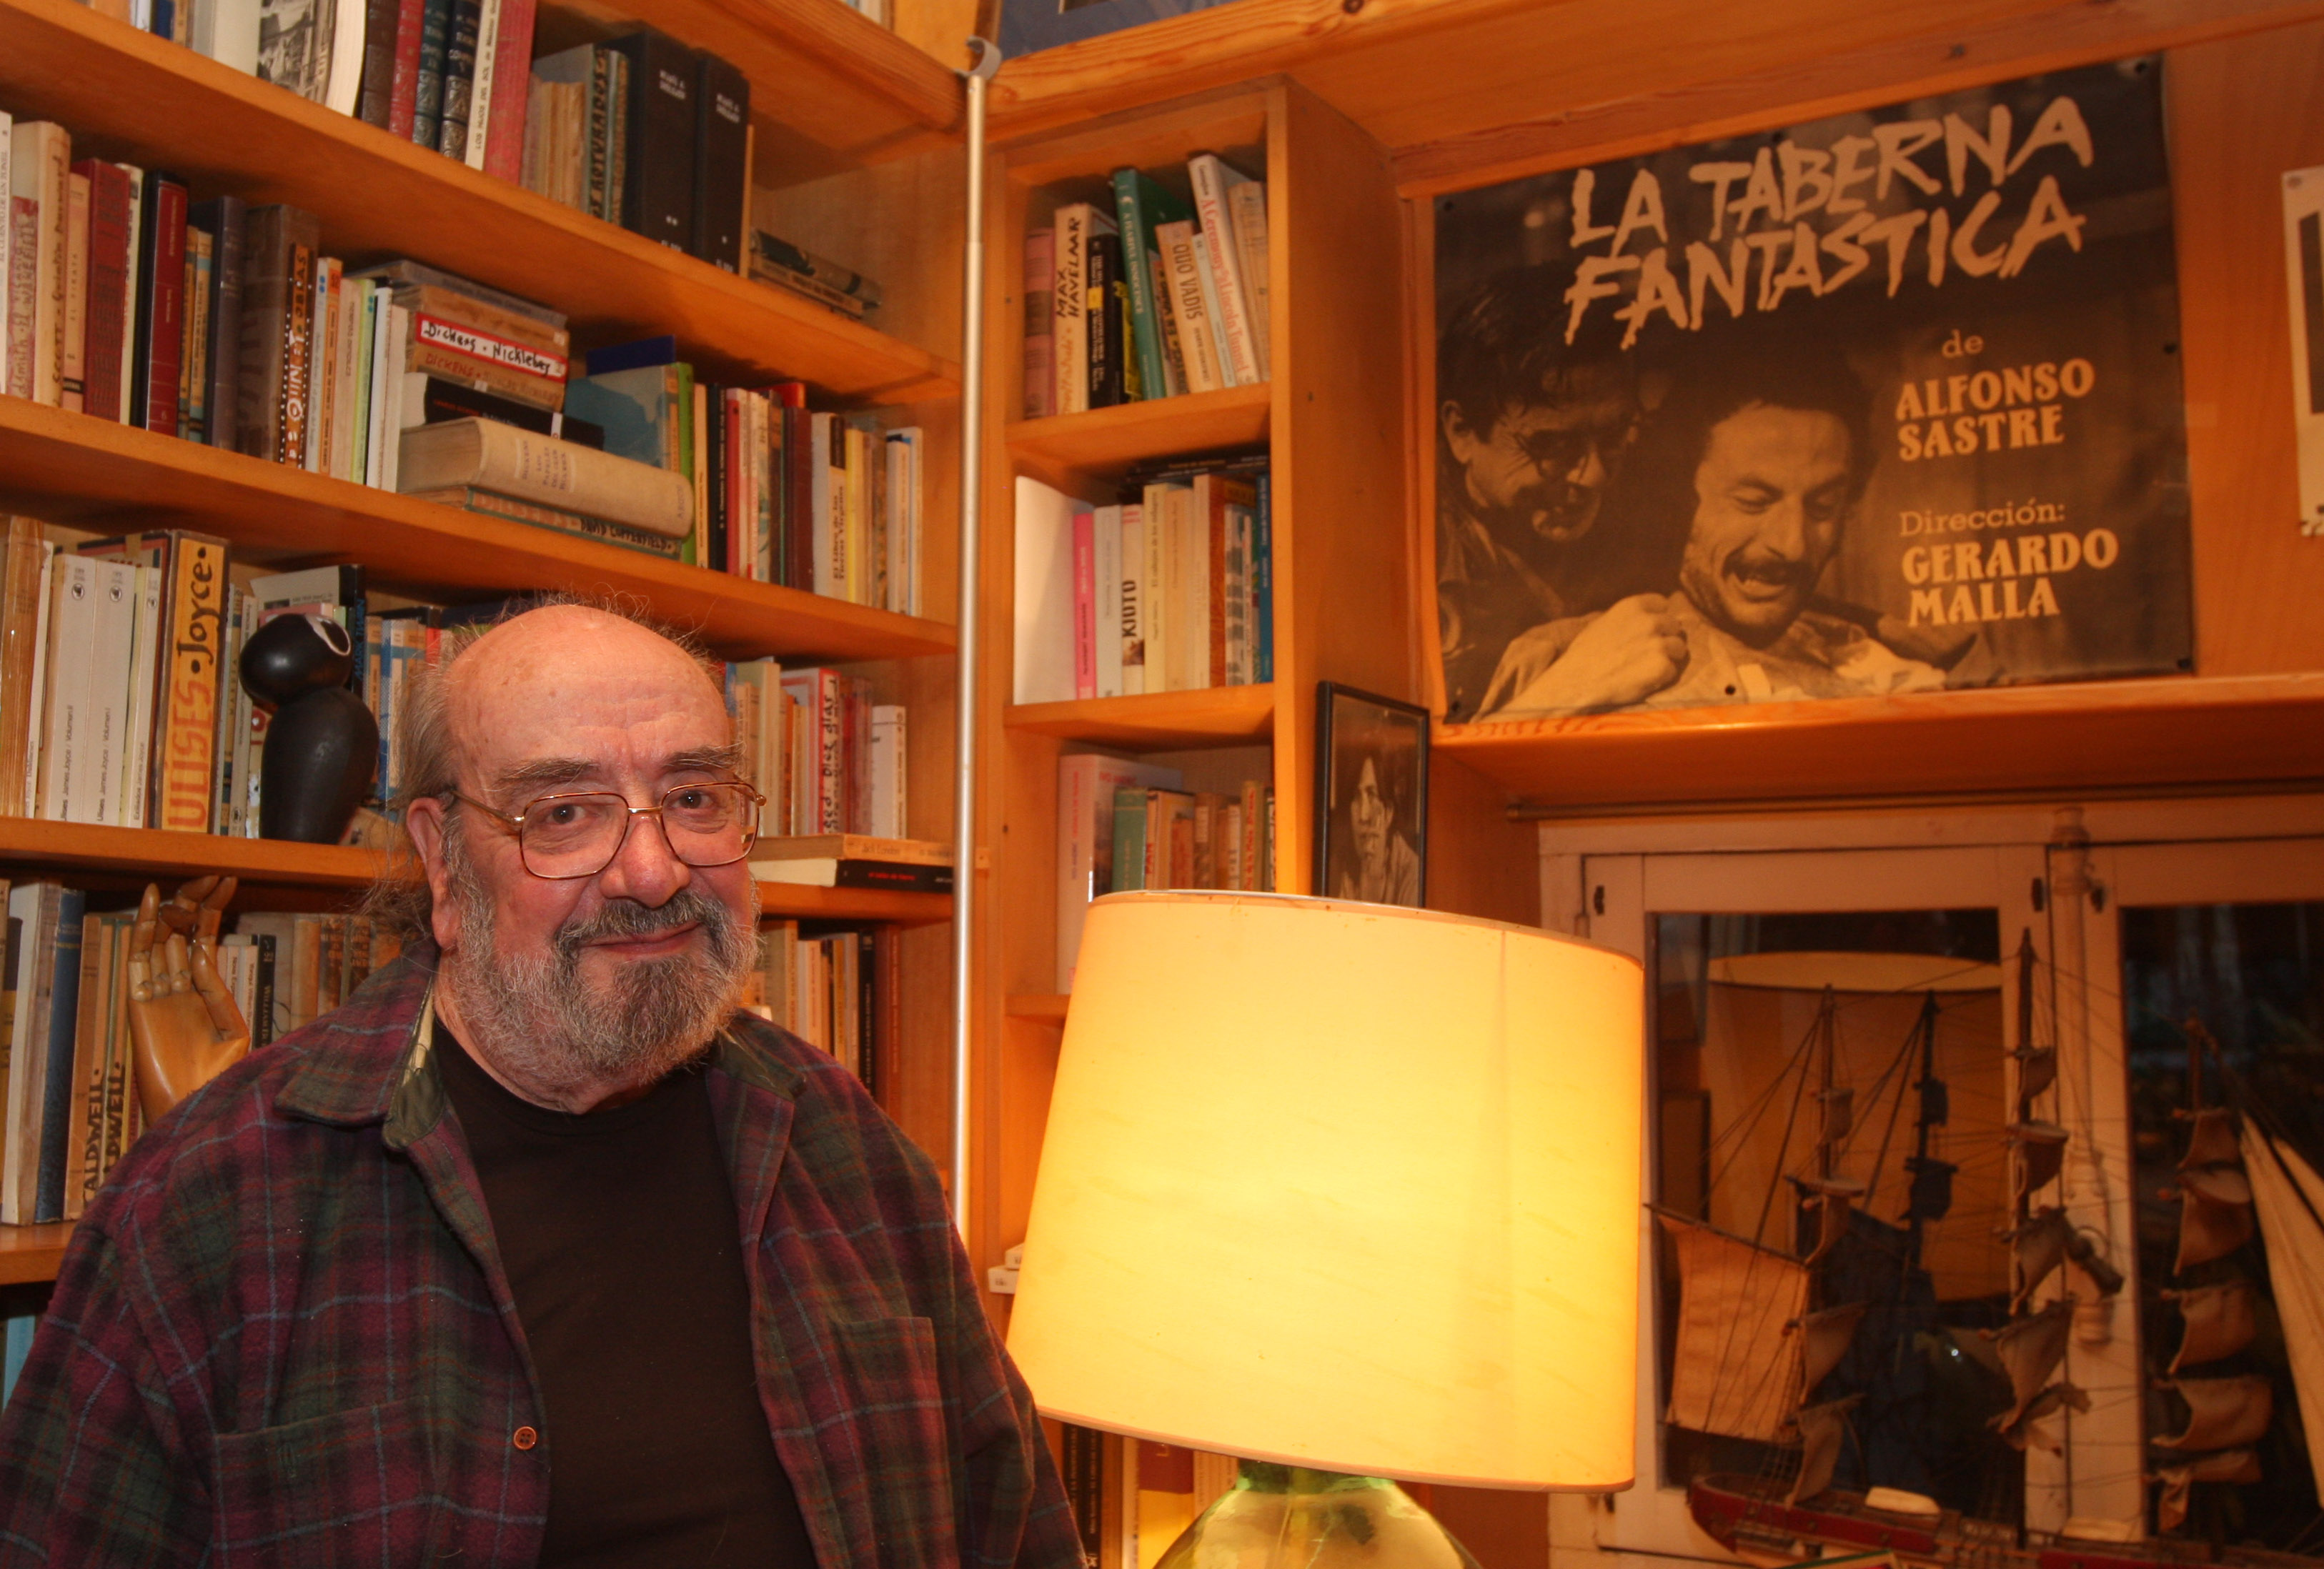 Muere el dramaturgo Alfonso Sastre, autor de radical compromiso político